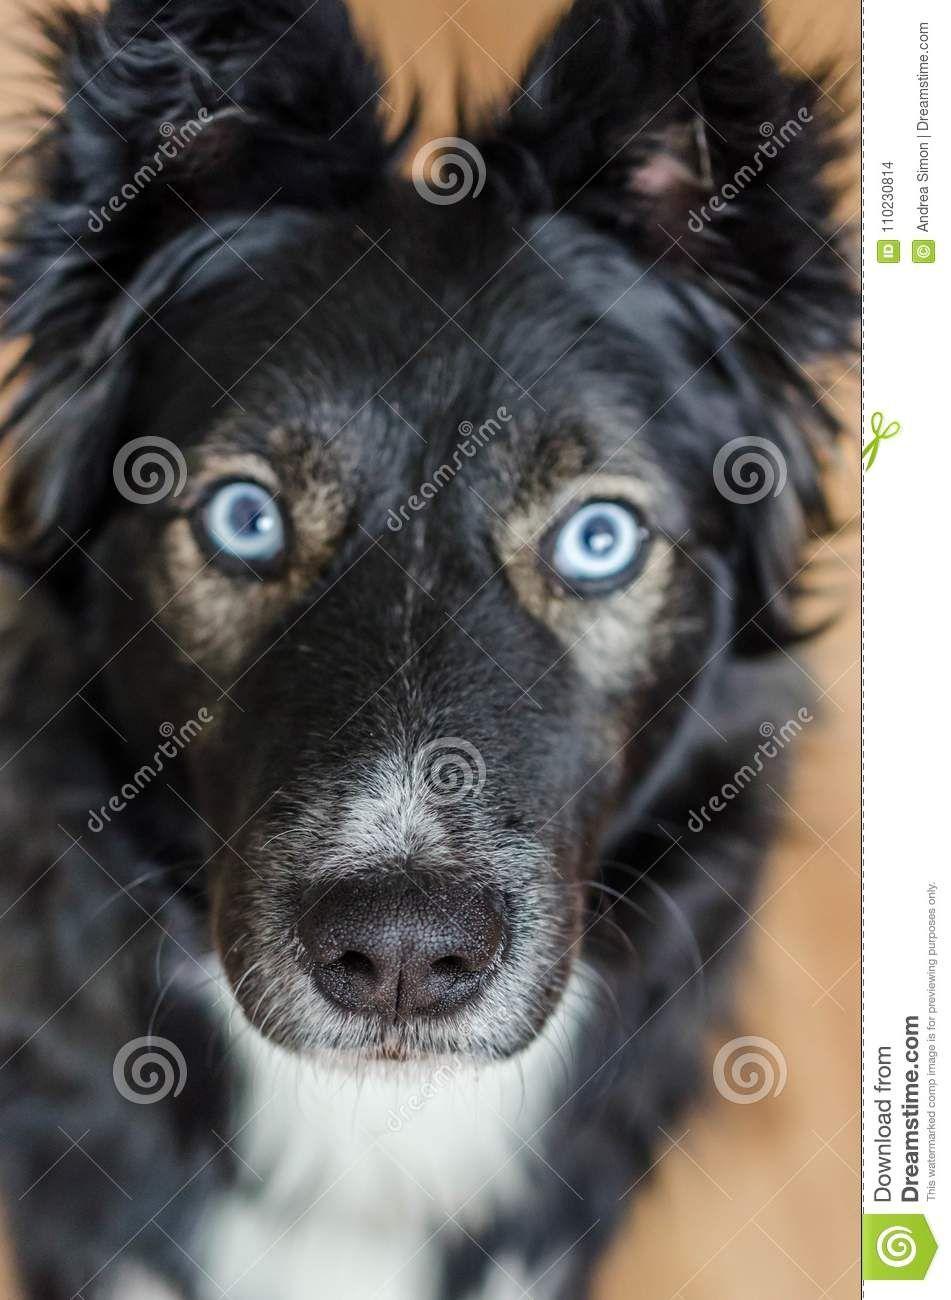 Border Collie Husky Mix Stock Photo Image Of Coat Close Border Collie Geschichte Und Rassebeschreibung In 2020 Border Collie Husky Mix Husky Mix Dogs Golden Retriever